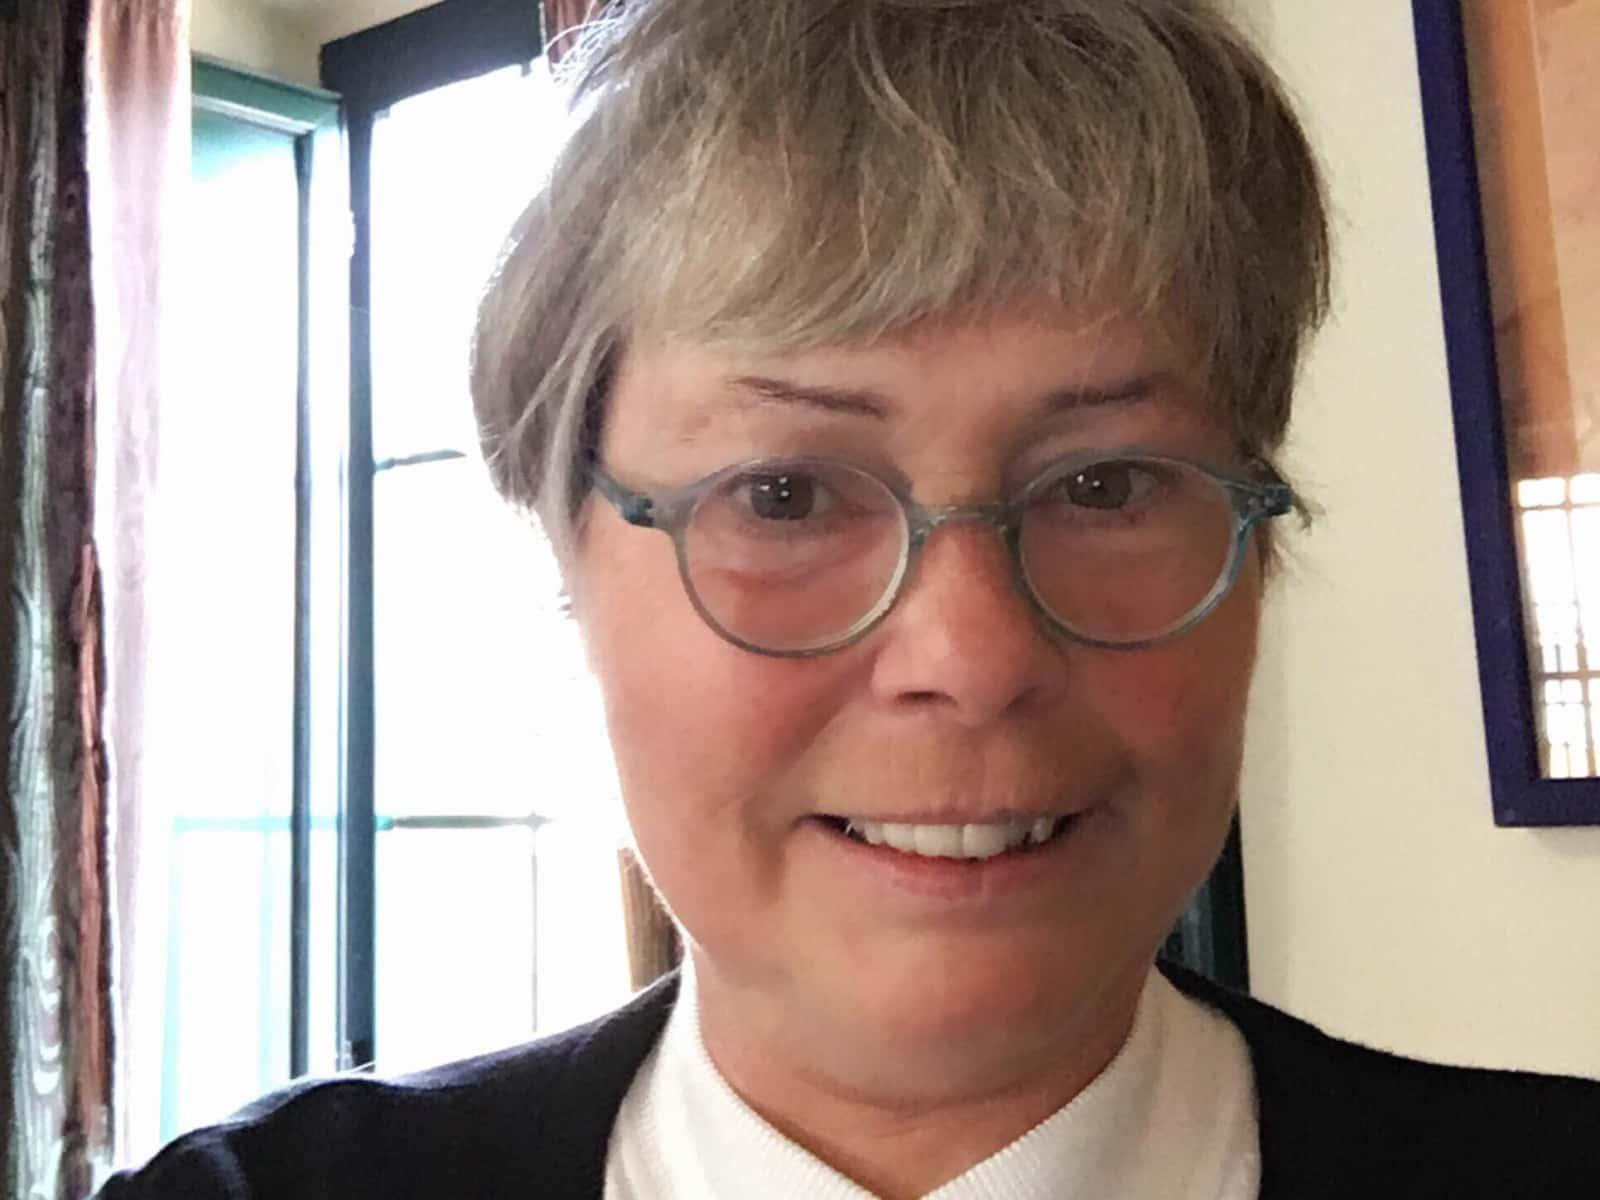 Marianna from Kongens Lyngby, Denmark